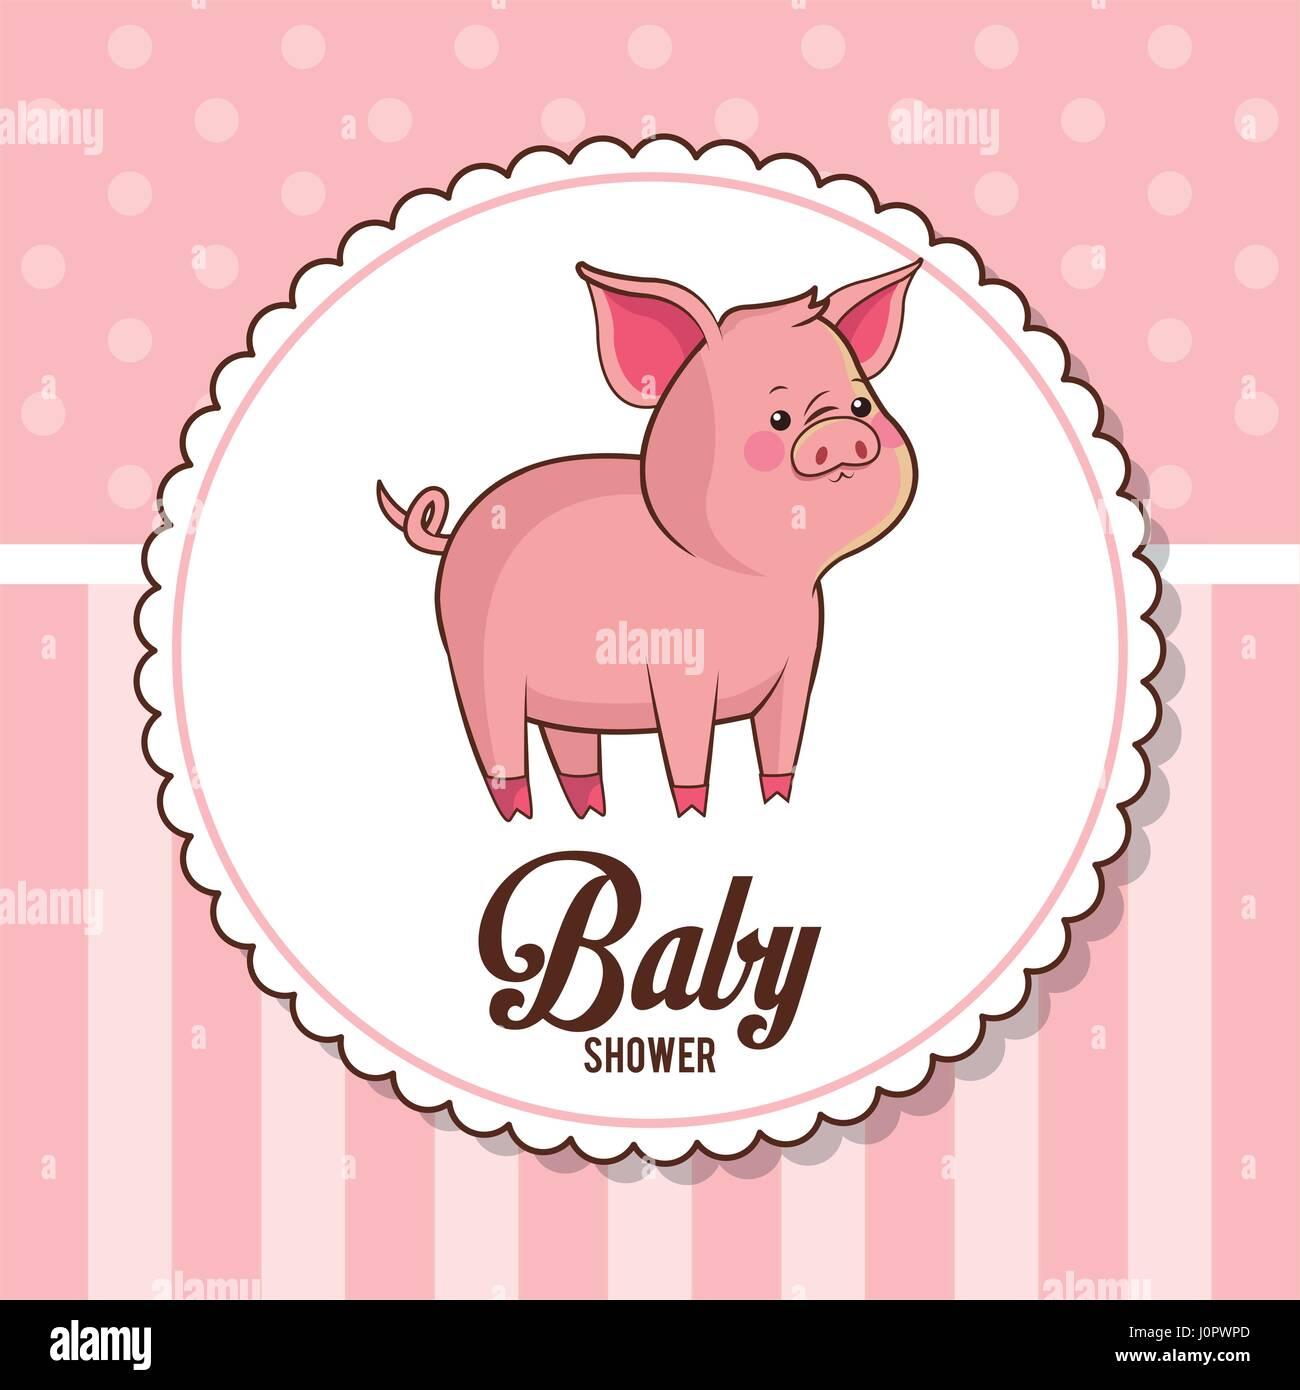 Baby Shower Card Invitation Cute Piggy Stock Vector Art